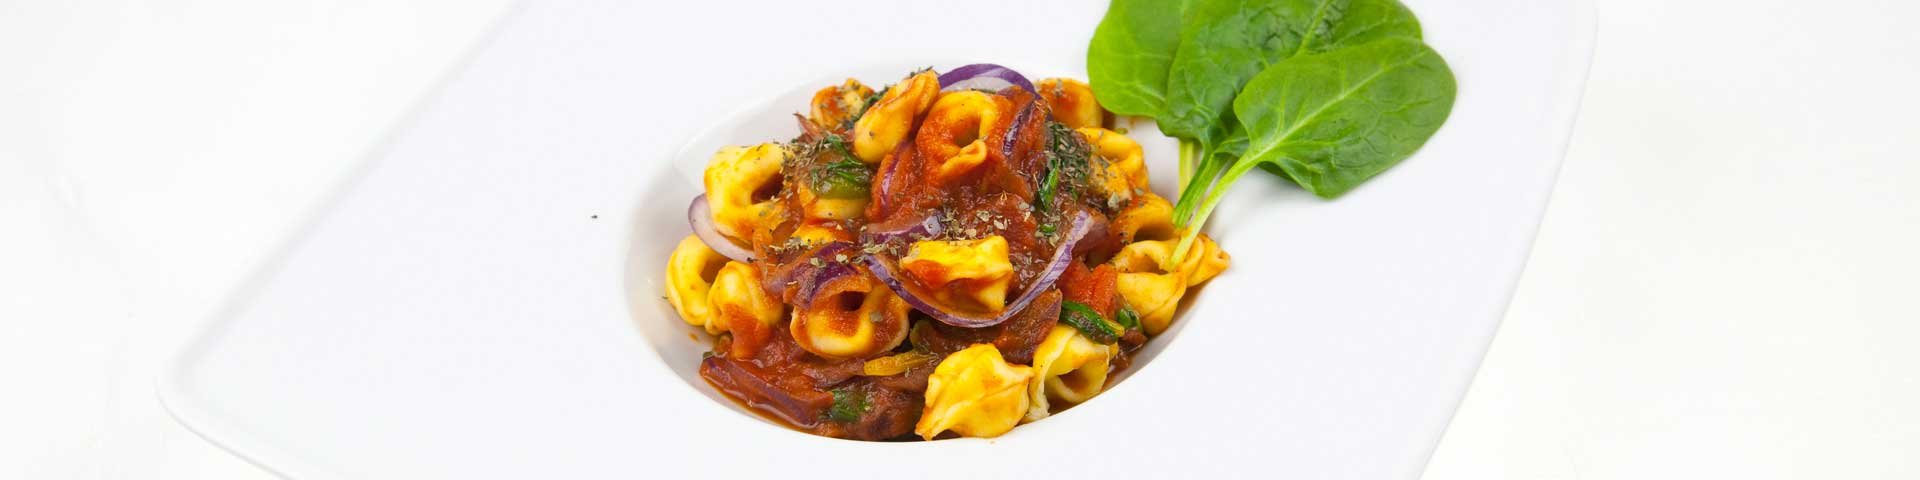 Tortellini pomidorowo-szpinakowe